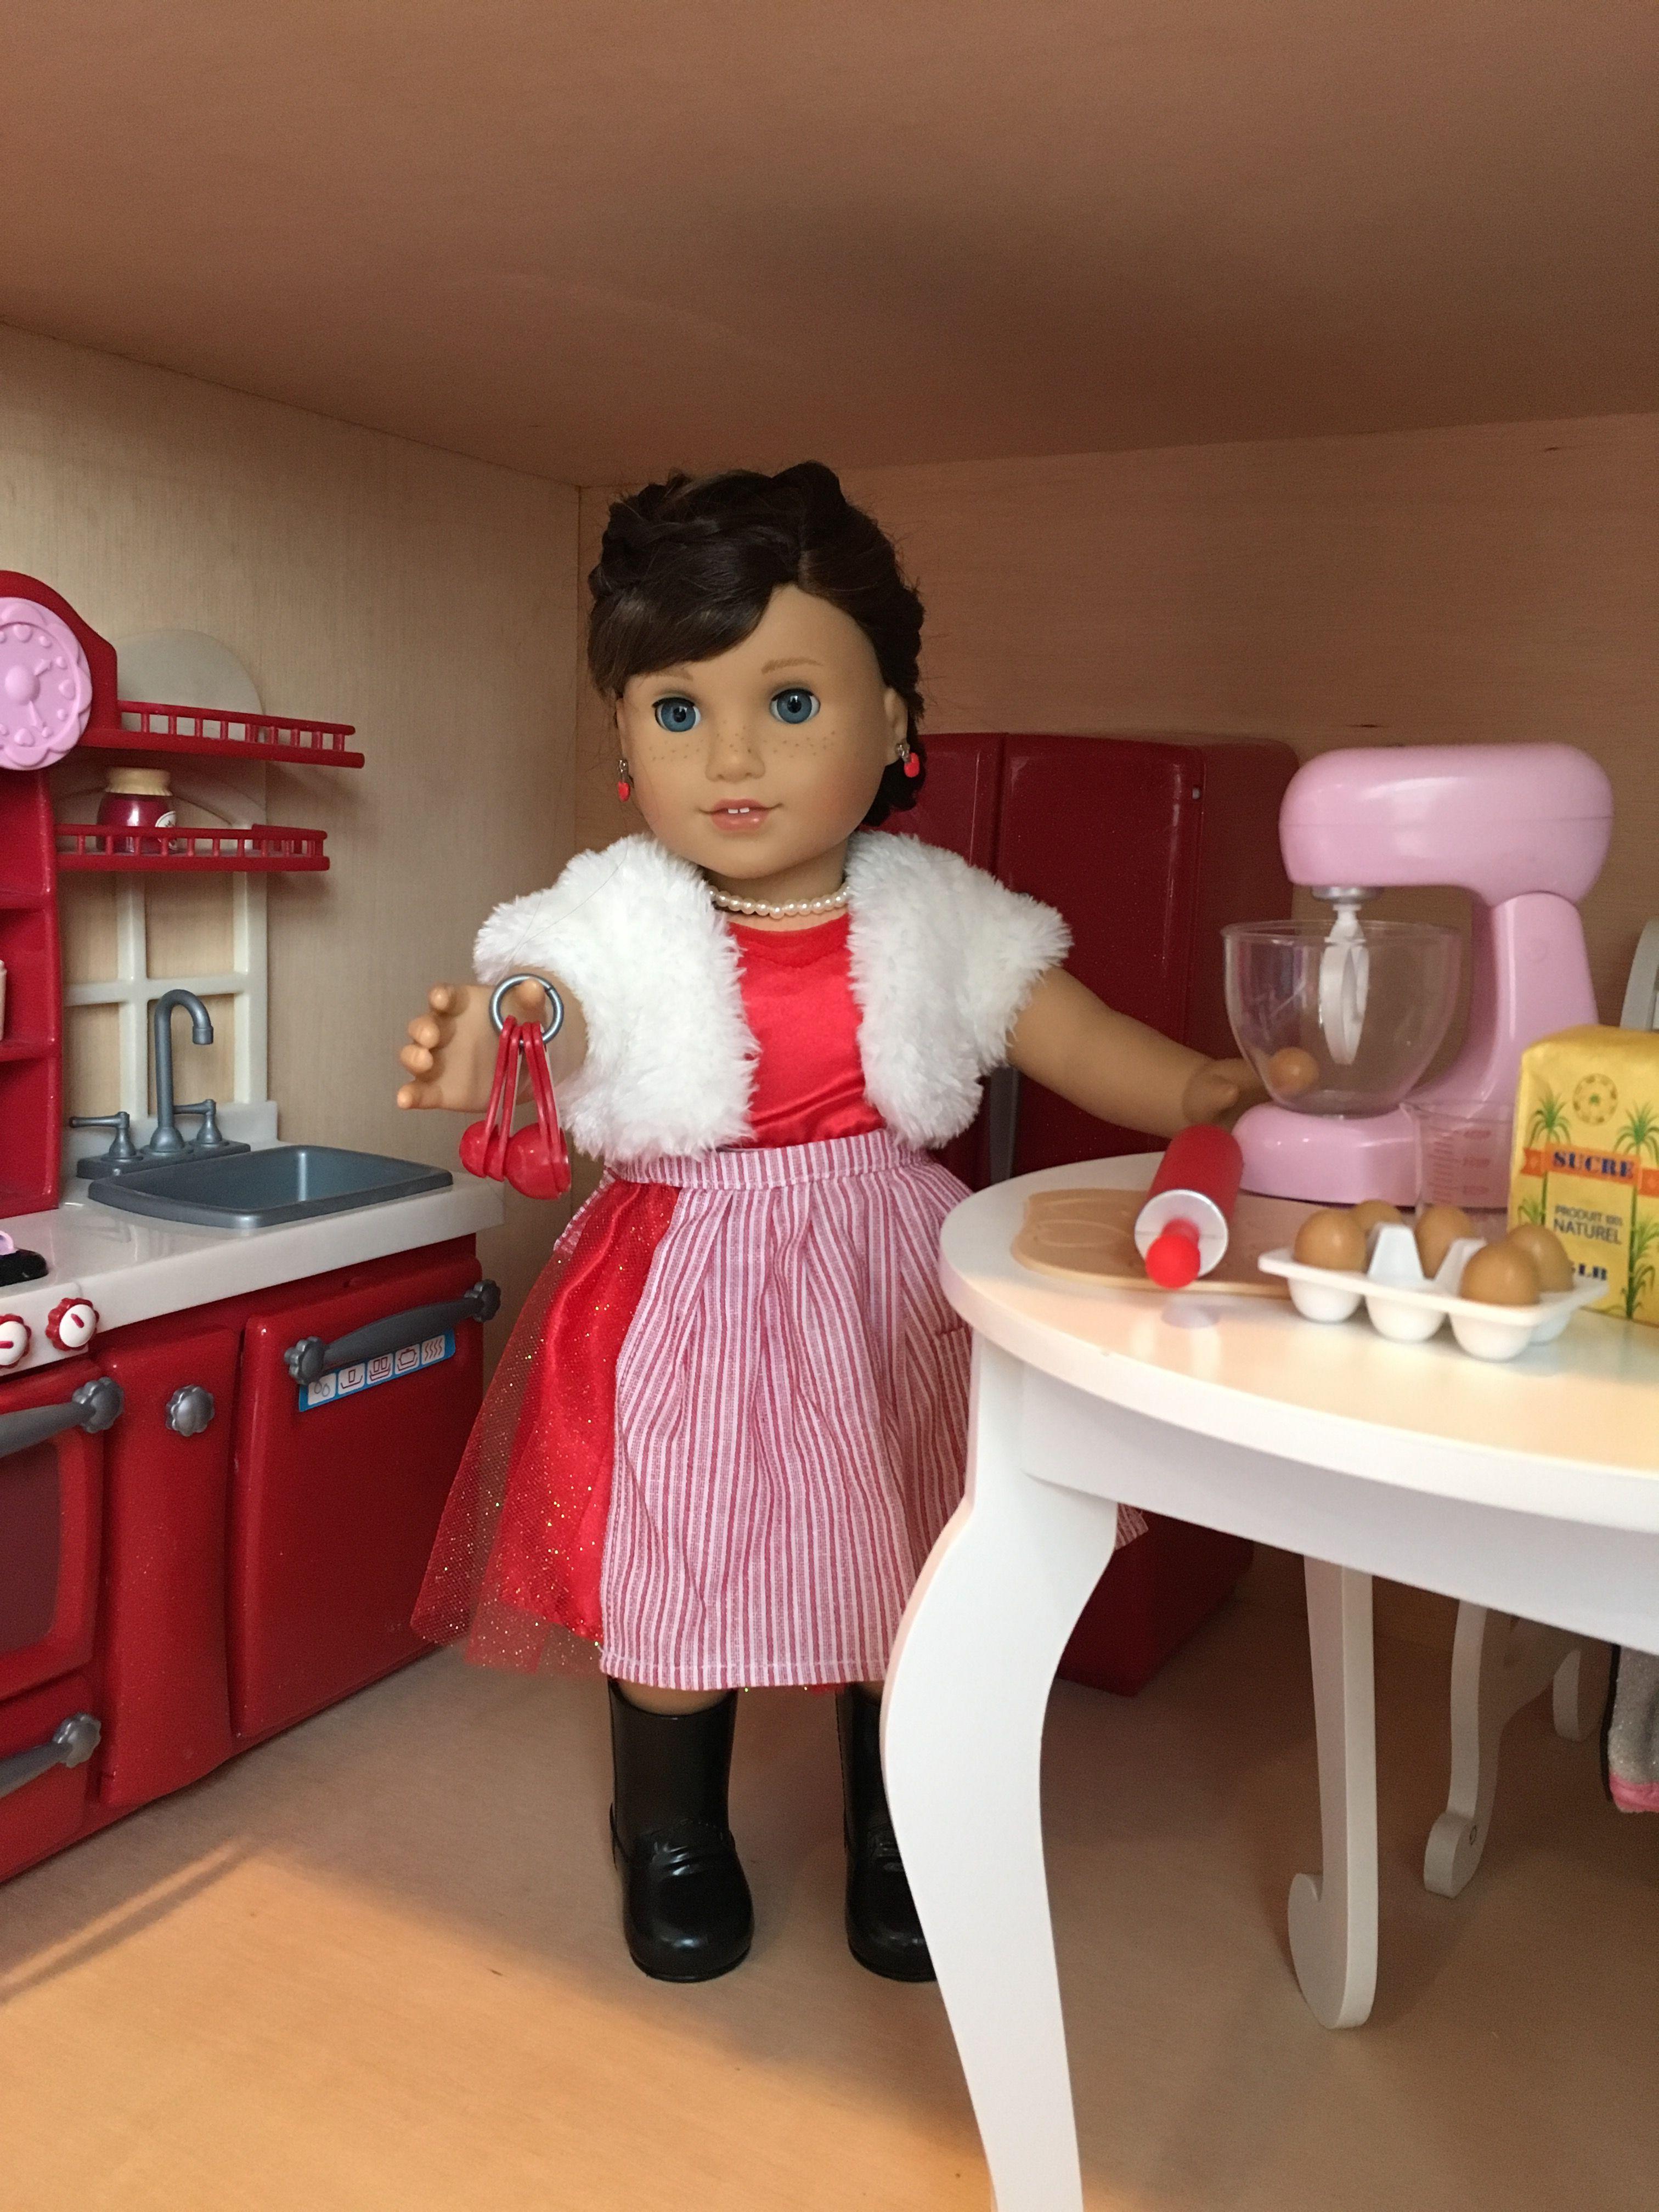 Grace is baking Christmas cookies